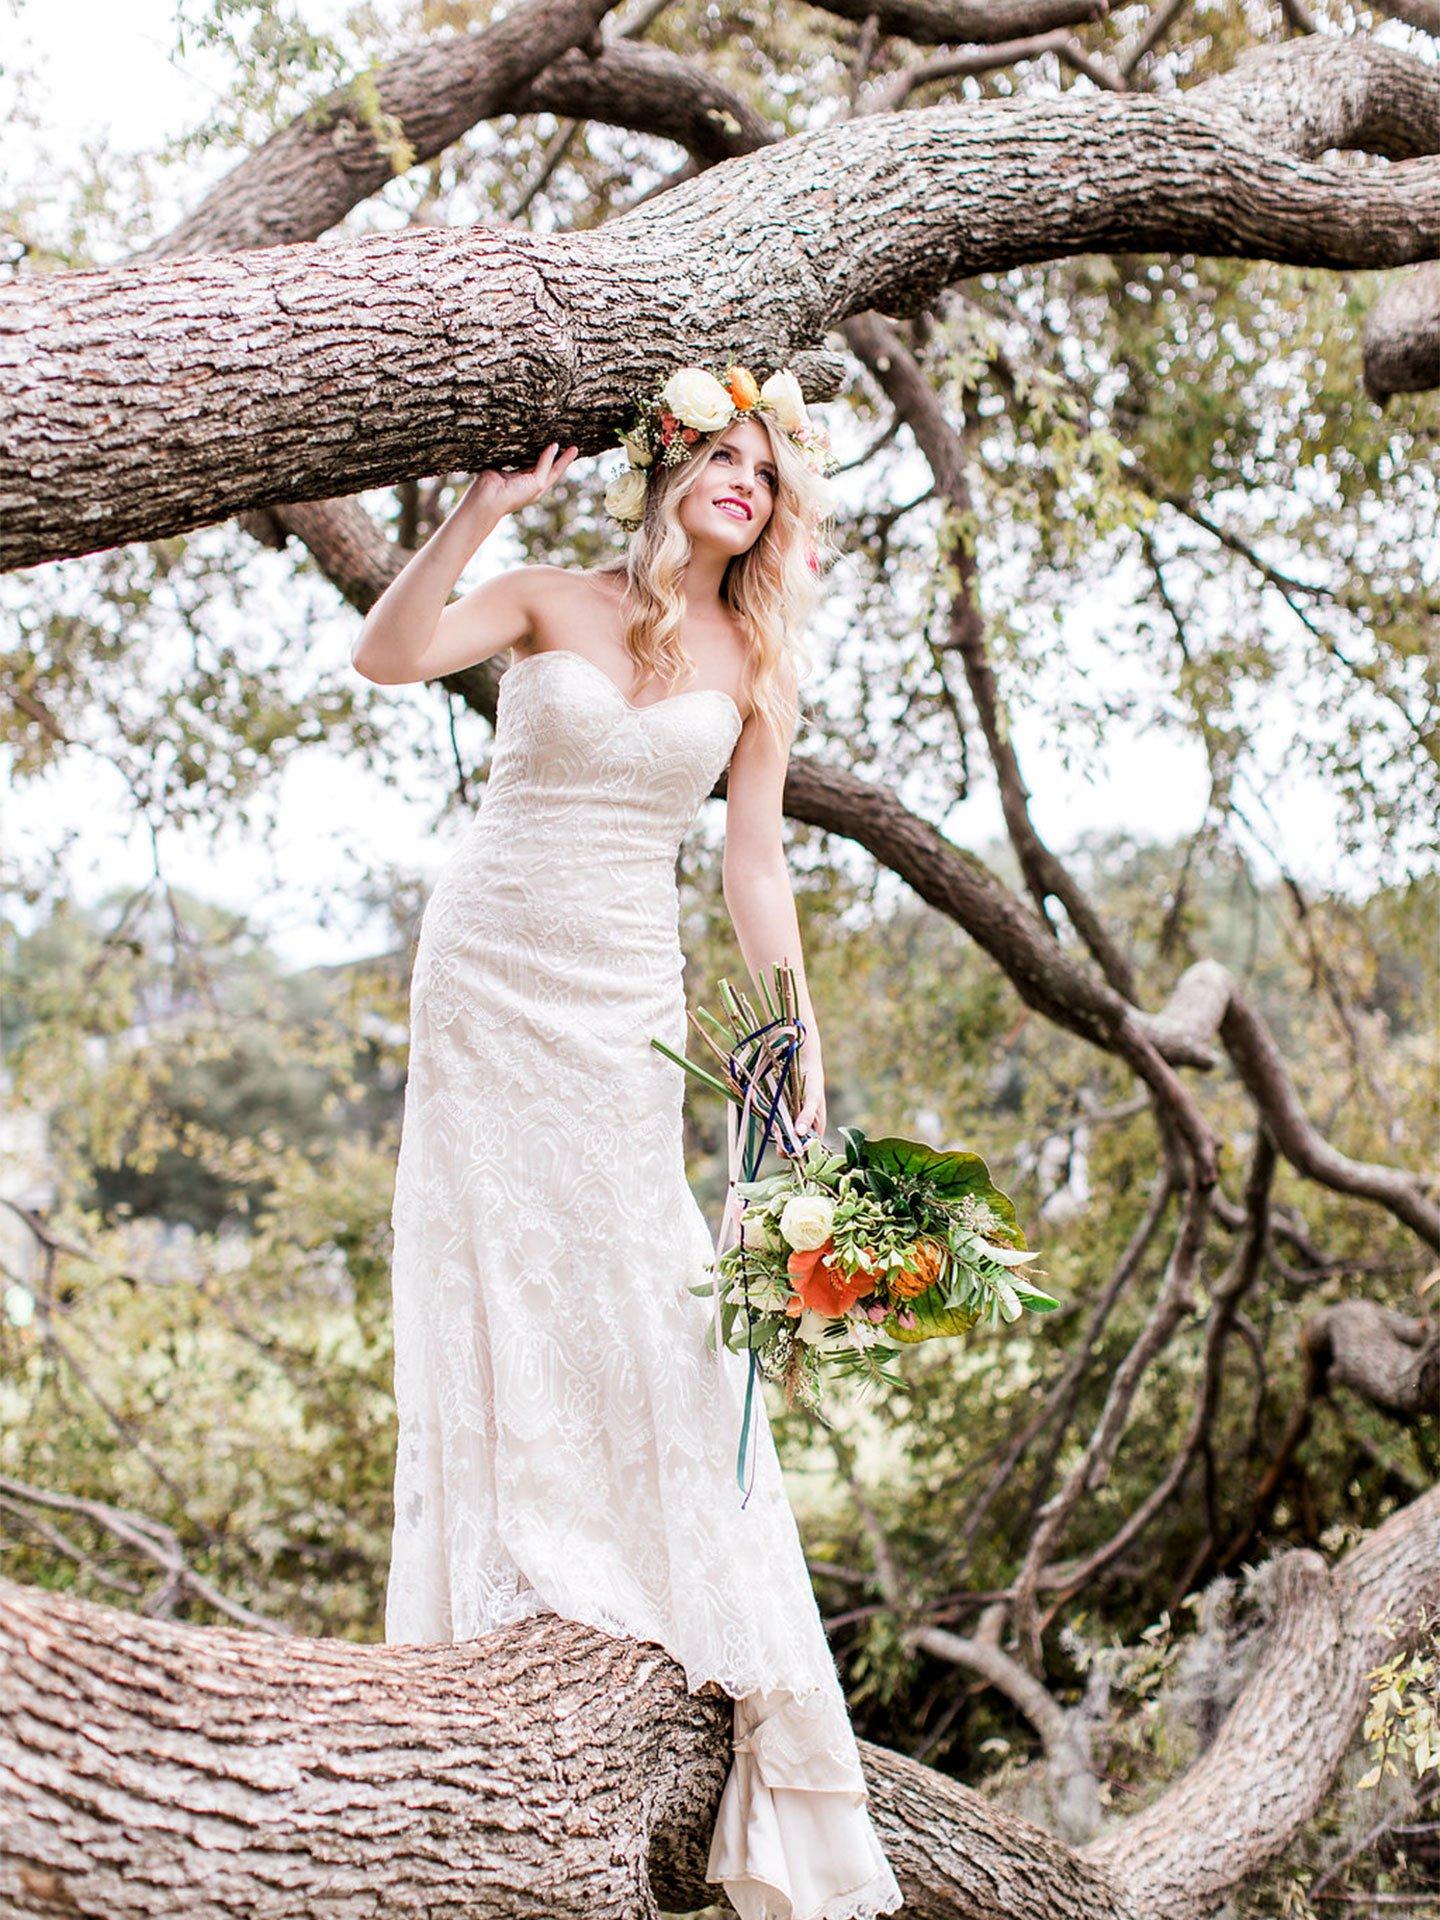 Maggie-Sottero-Wedding-Dress-Fredricka-Maggie-Bride-ivory-and-beau-bridal-boutique-savannah-wedding-gown-svannah-wedding-dress.jpg